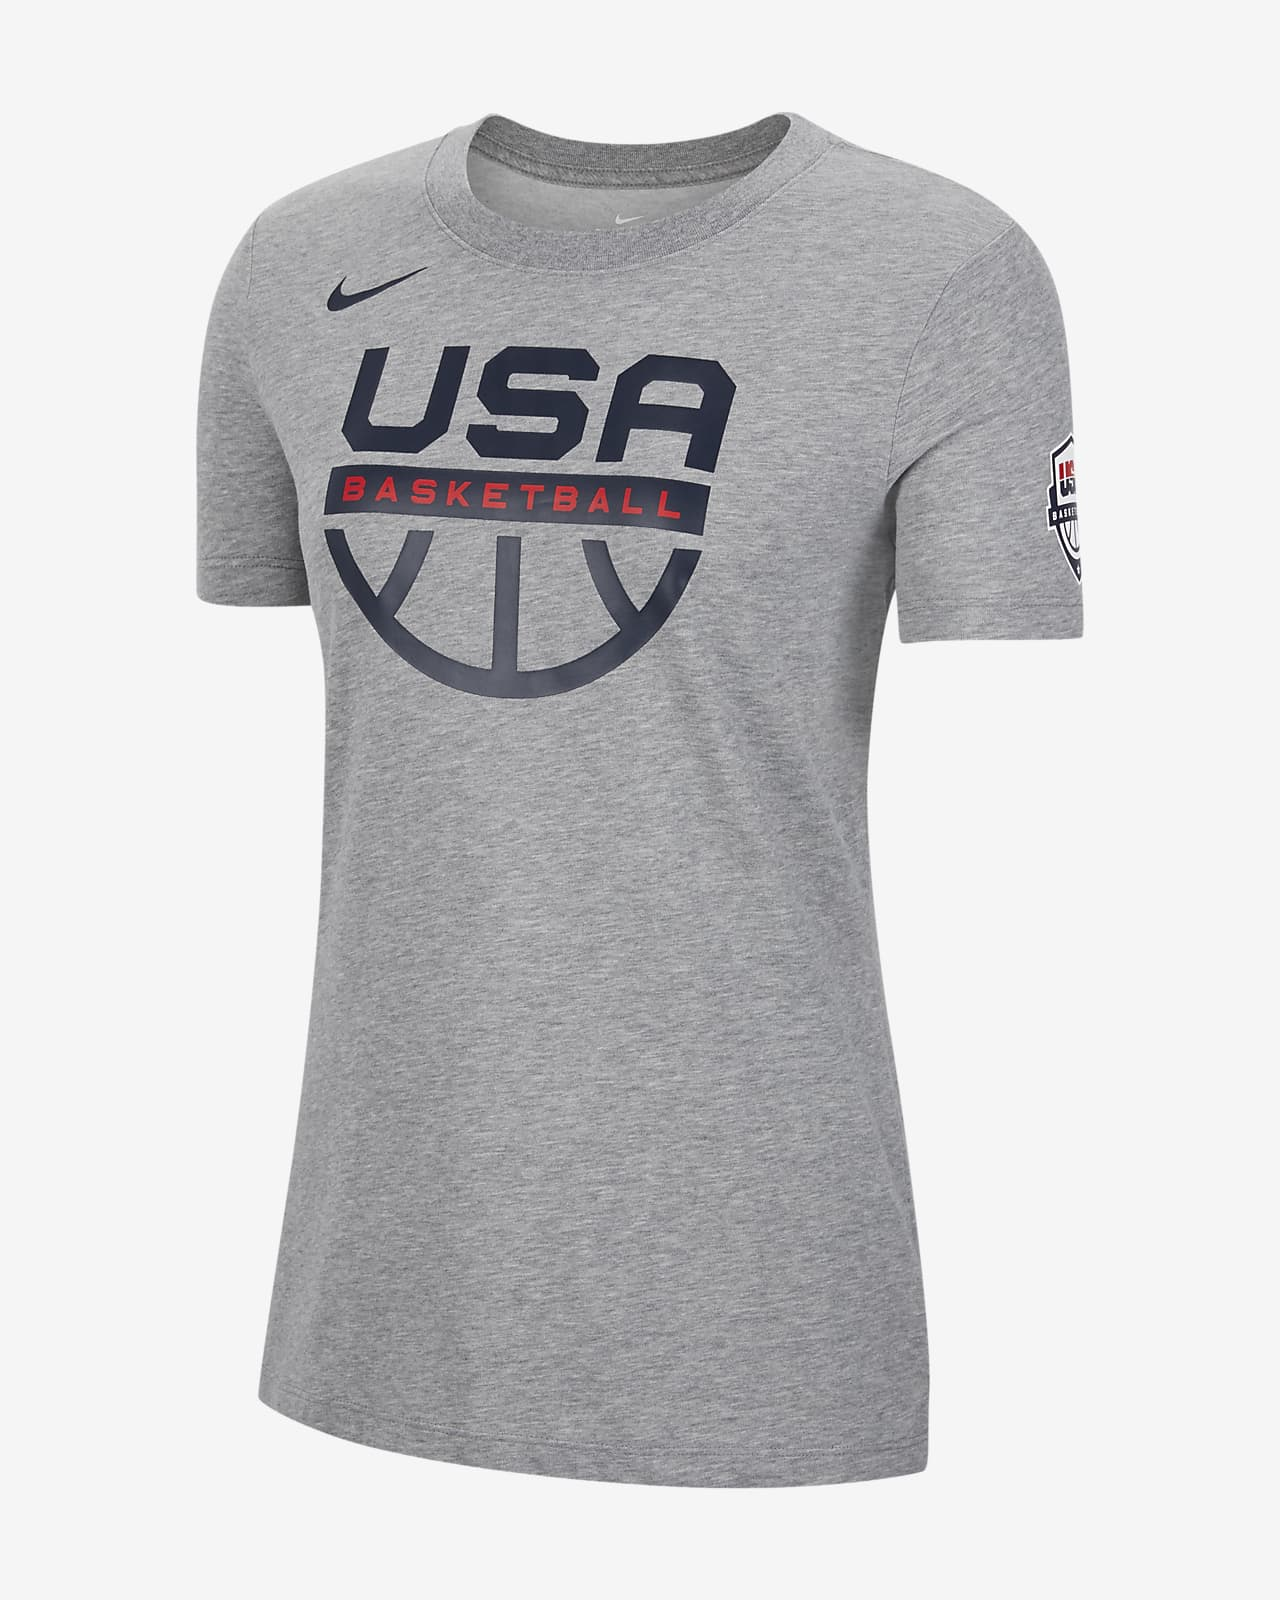 USAB Women's Basketball Practice T-Shirt